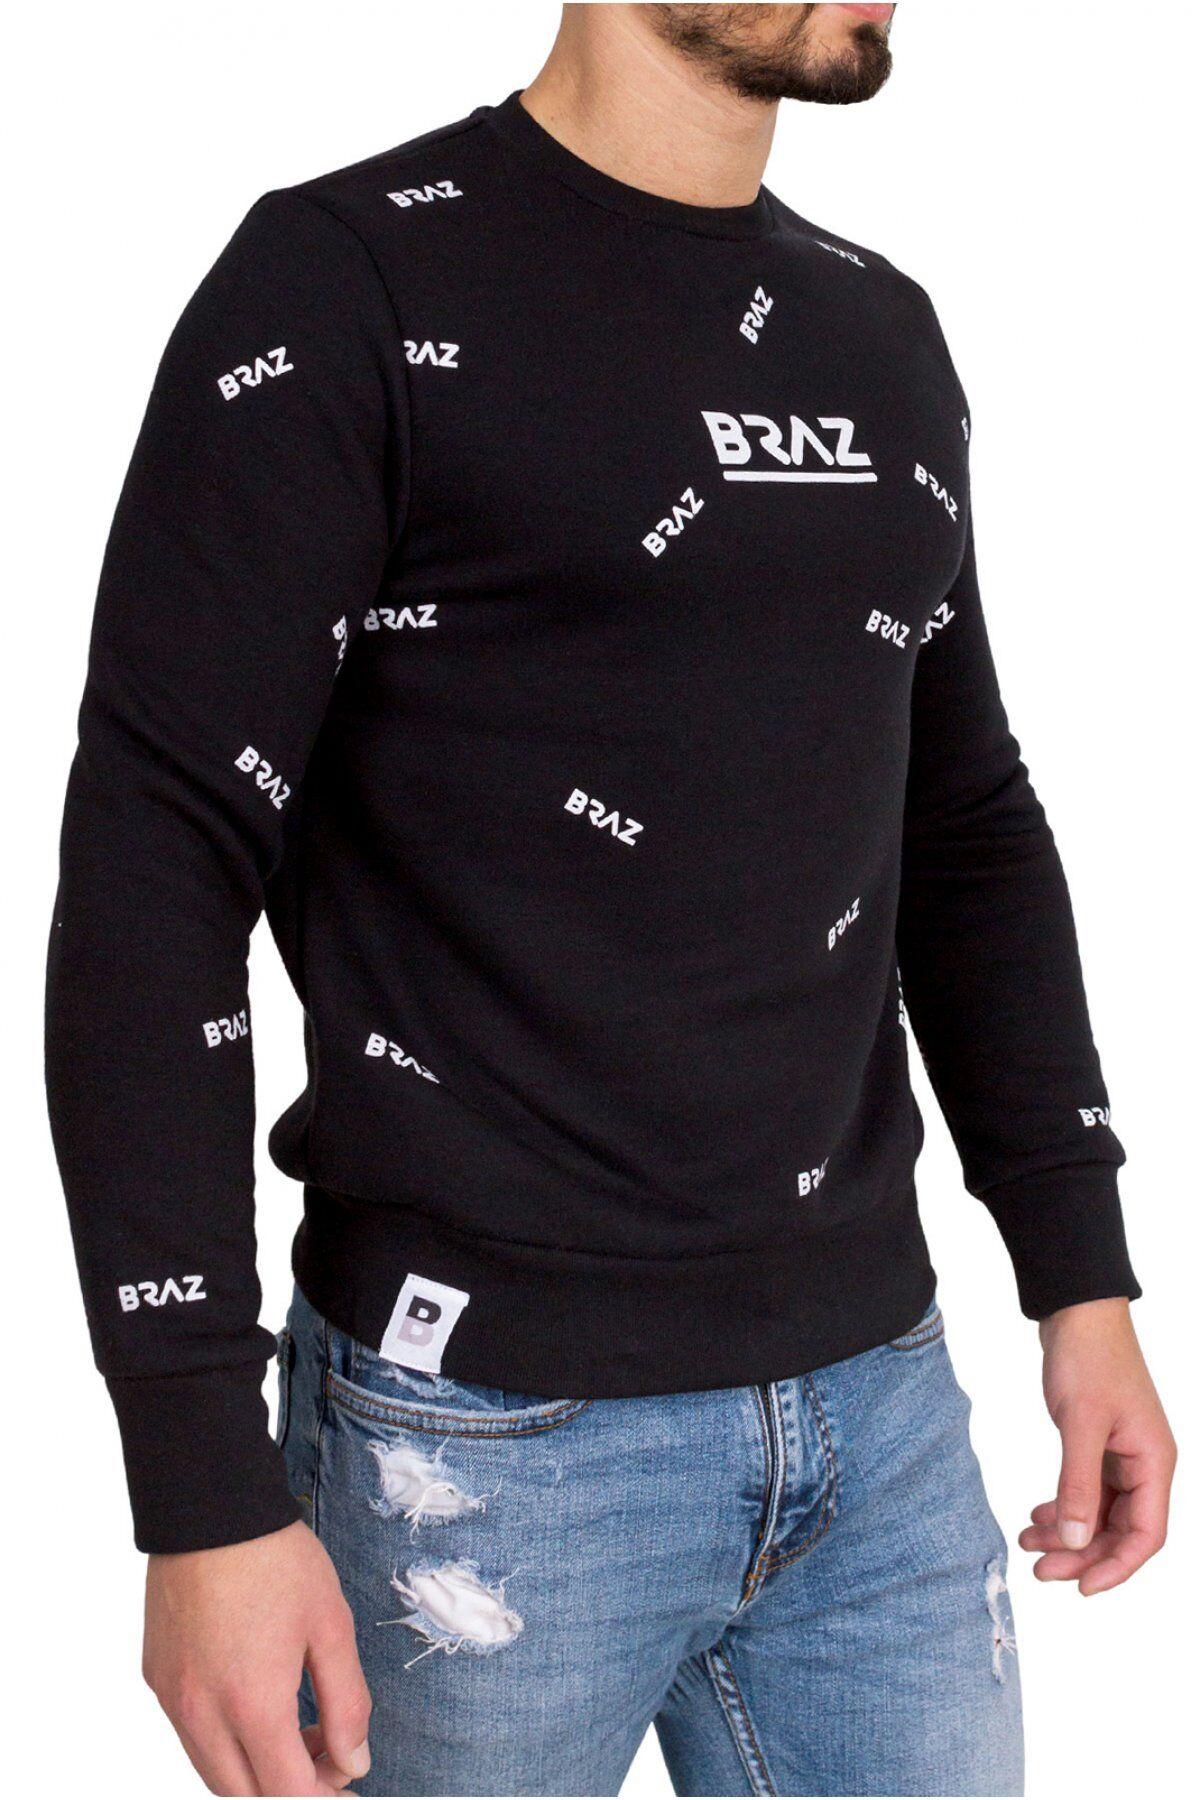 Braz Pull Coton Logo 120971tsh  -  Braz